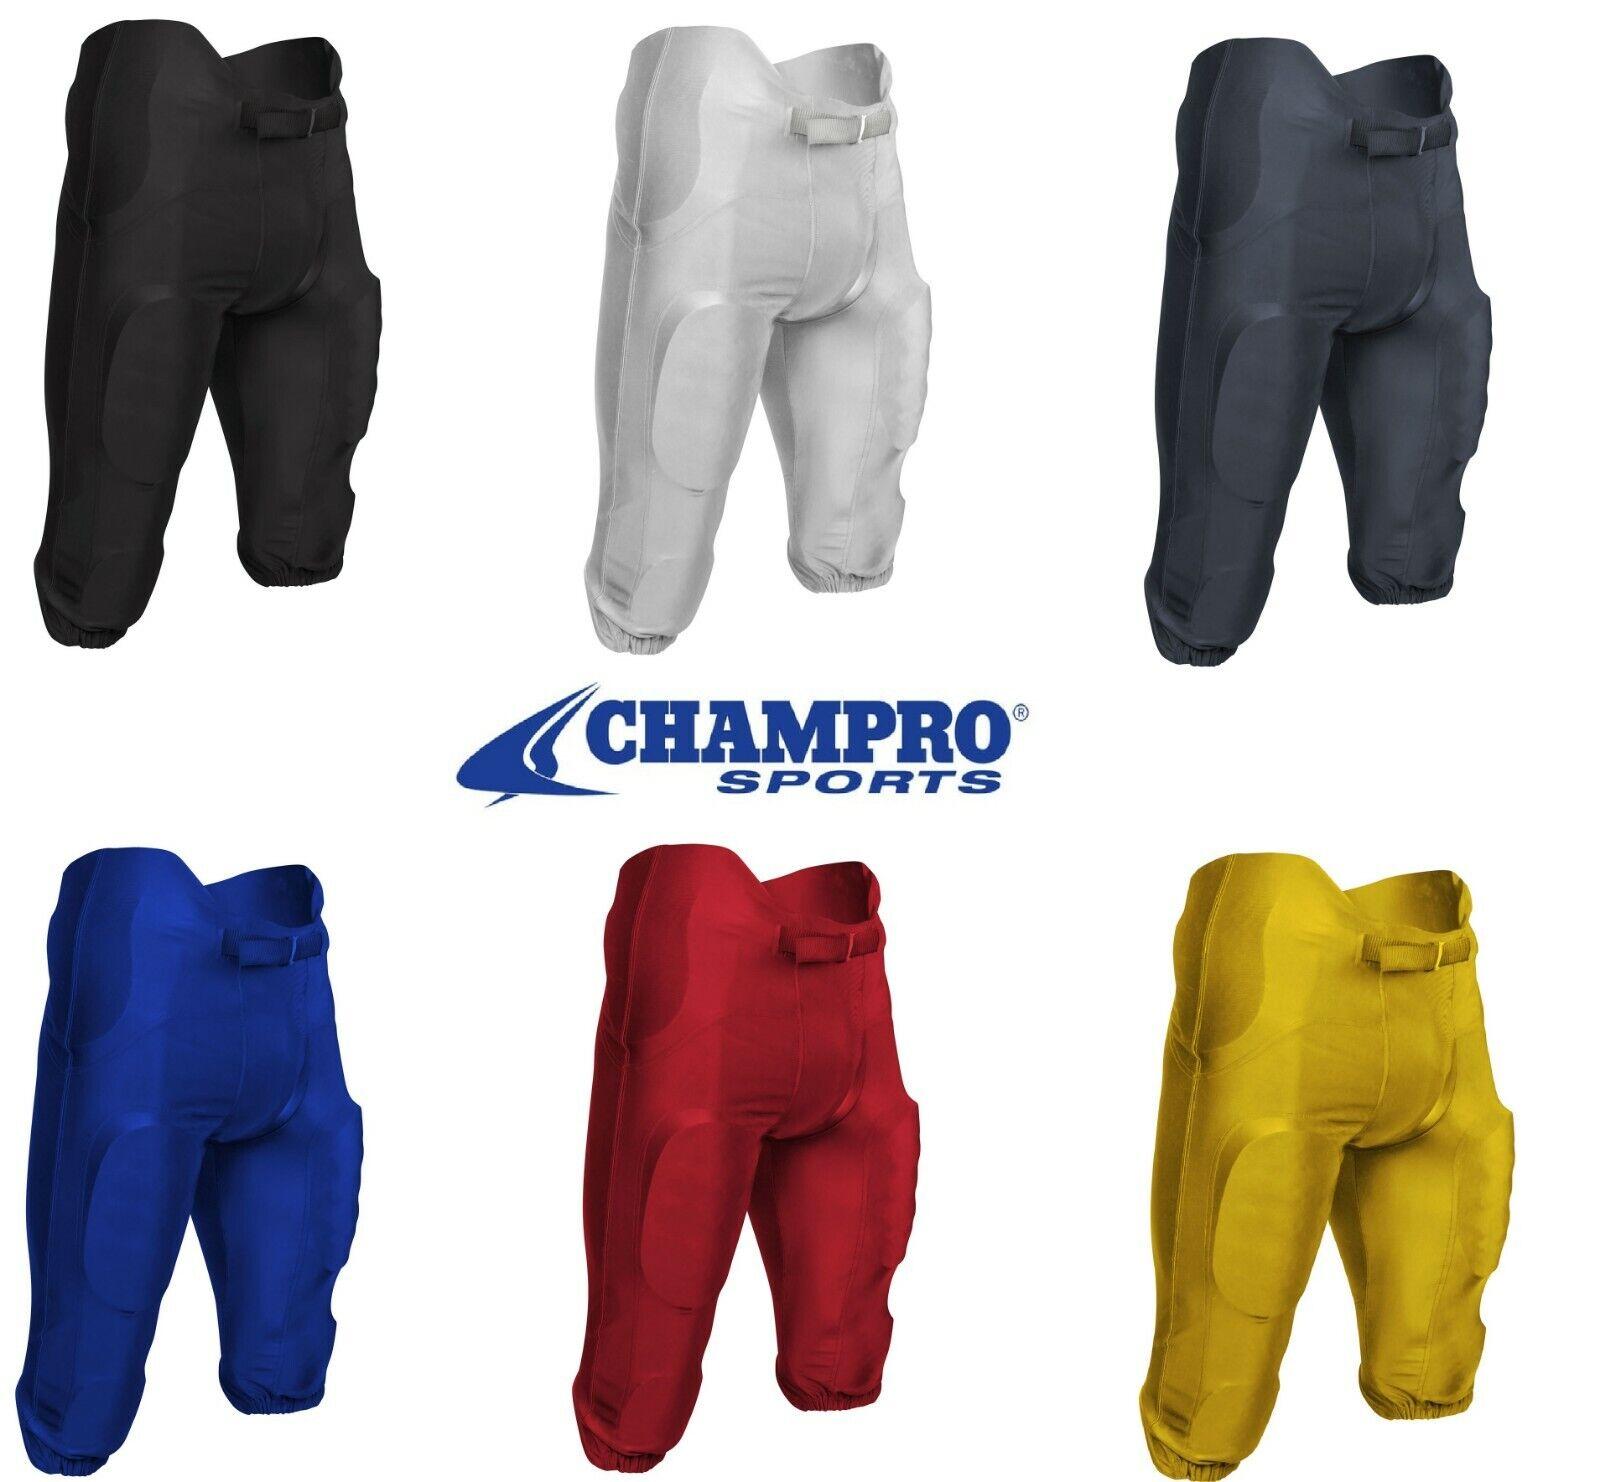 FPY6 Champro Sports Stretch Dazzle Boys Youth Football Pants w// Snaps W//O Pads